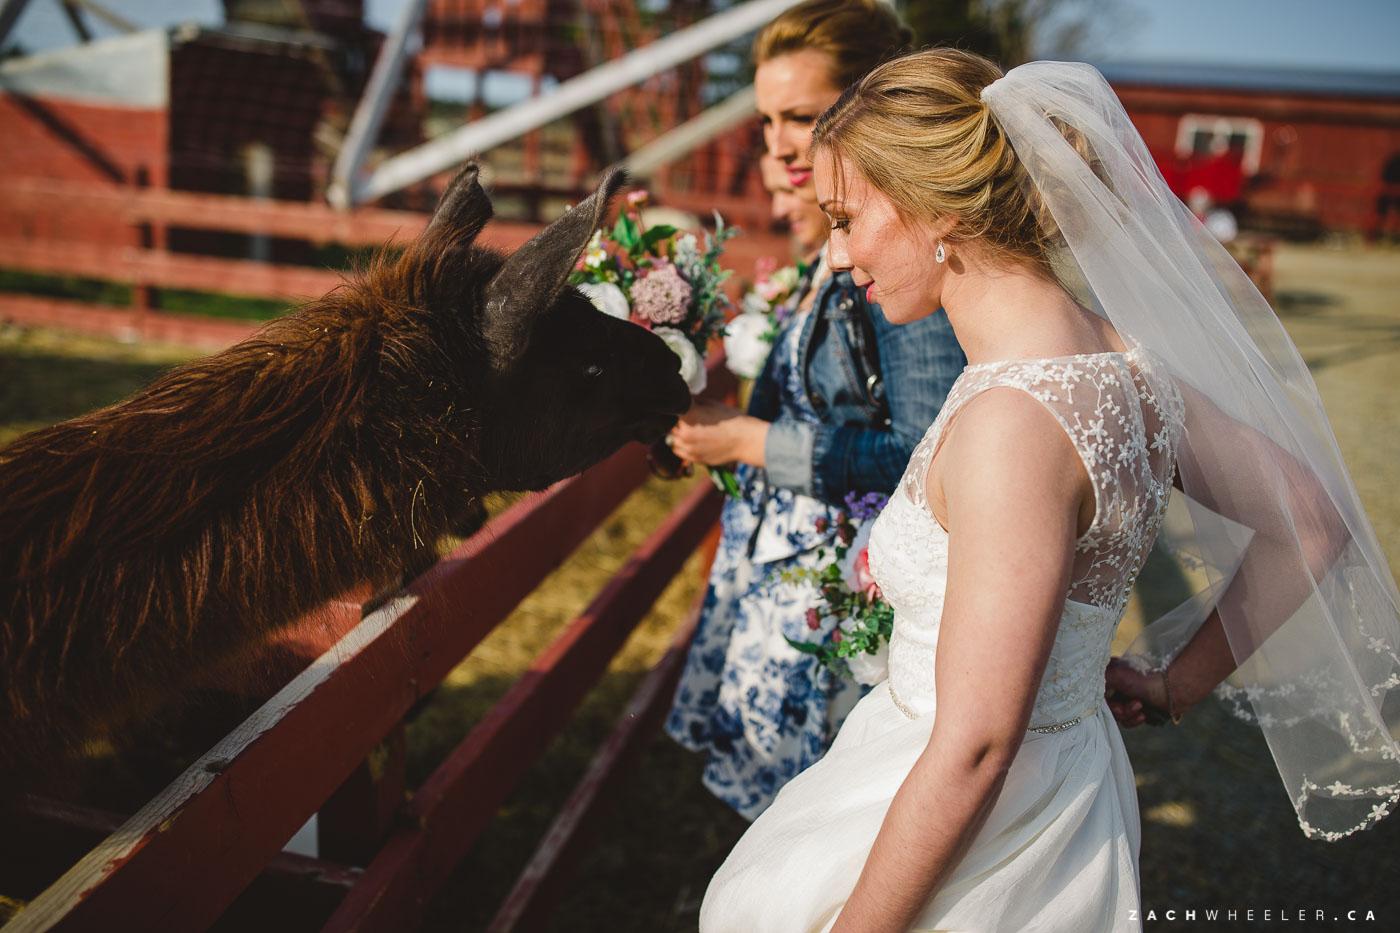 Sarah-Grant-Lesters-Fram-Wedding-67